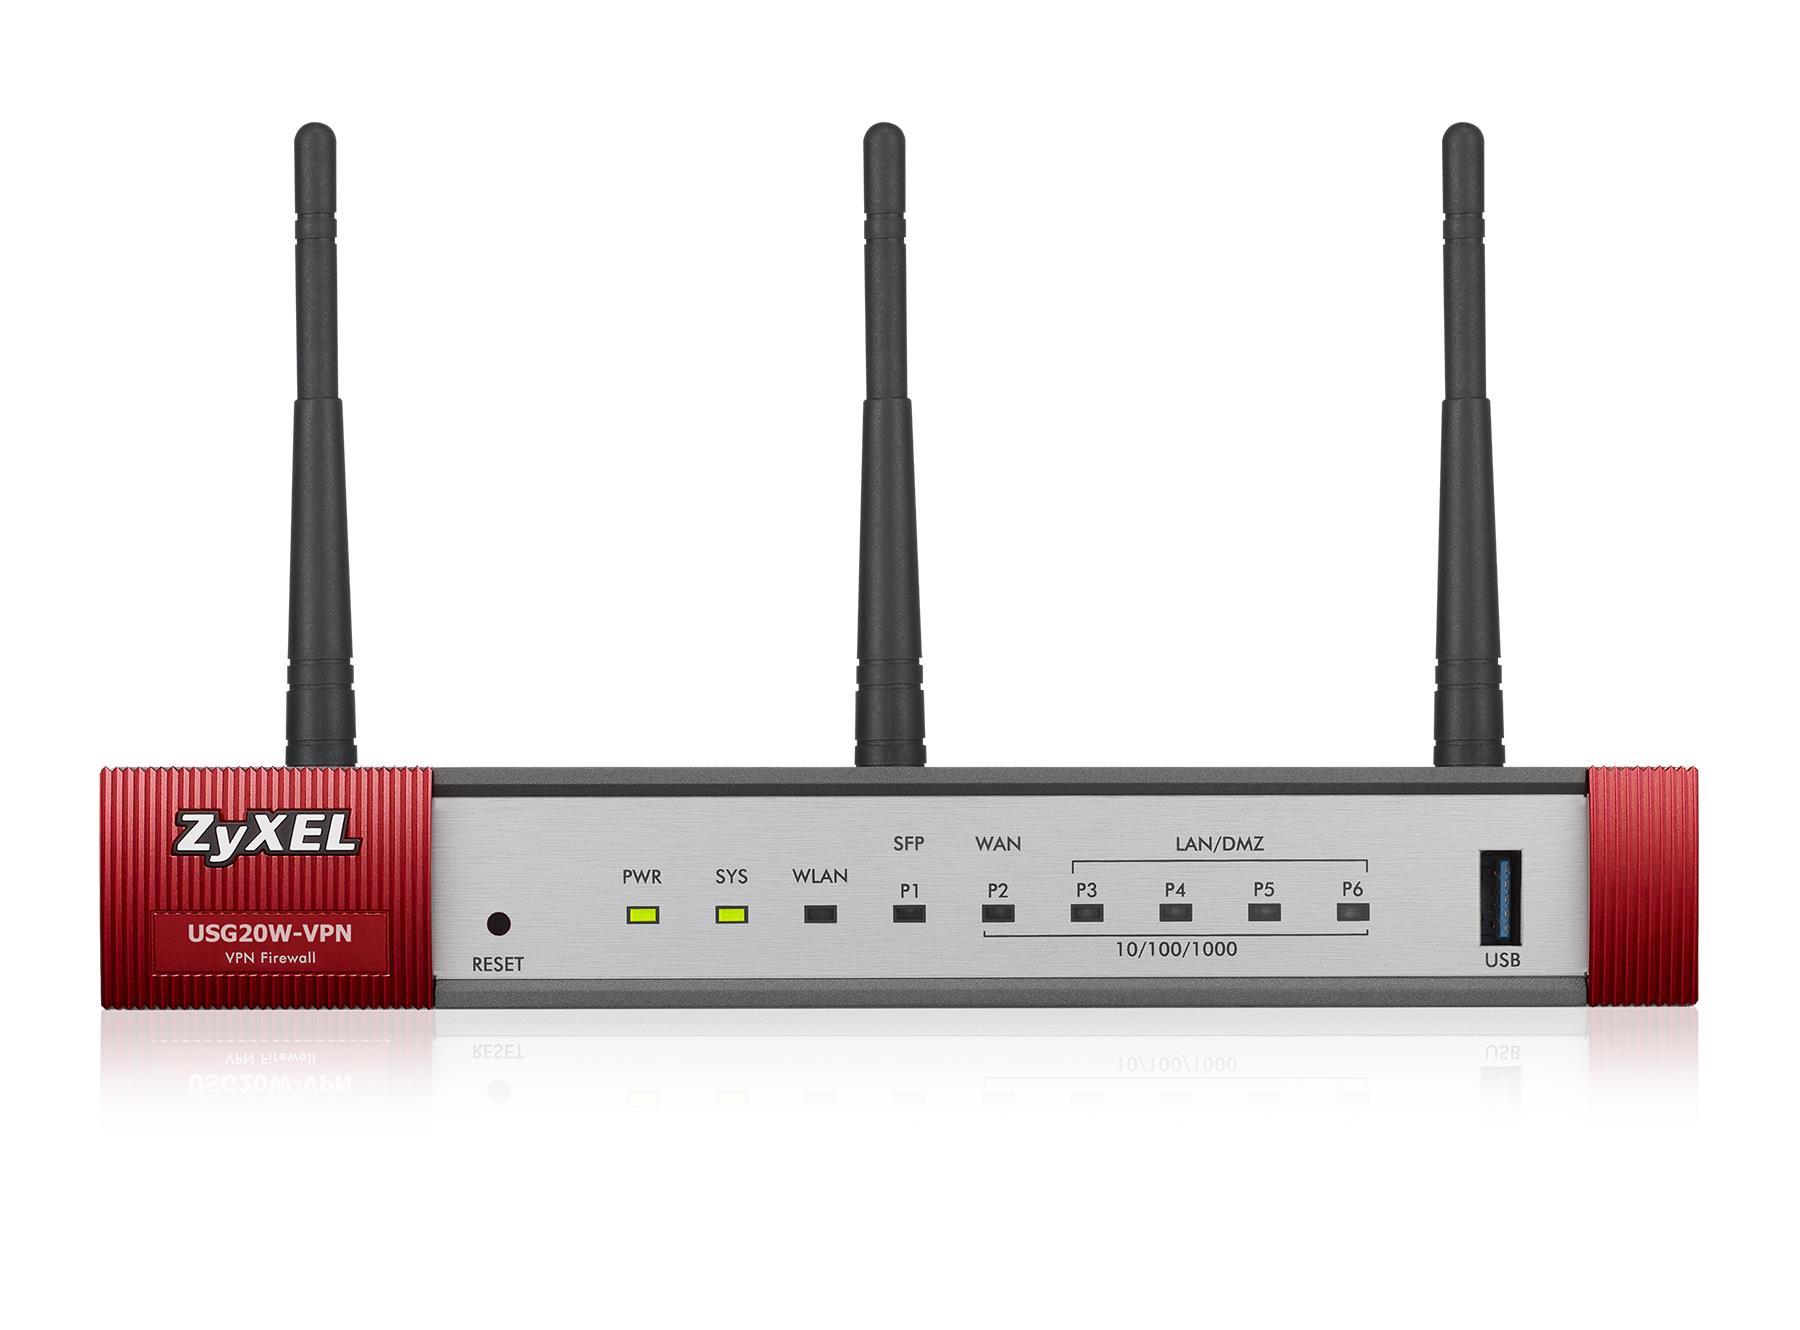 ZyXEL VPN Firewall USG20W 1 x WAN 1 x SFP 4 x LAN/DMZ IEEE 802.11ac/n